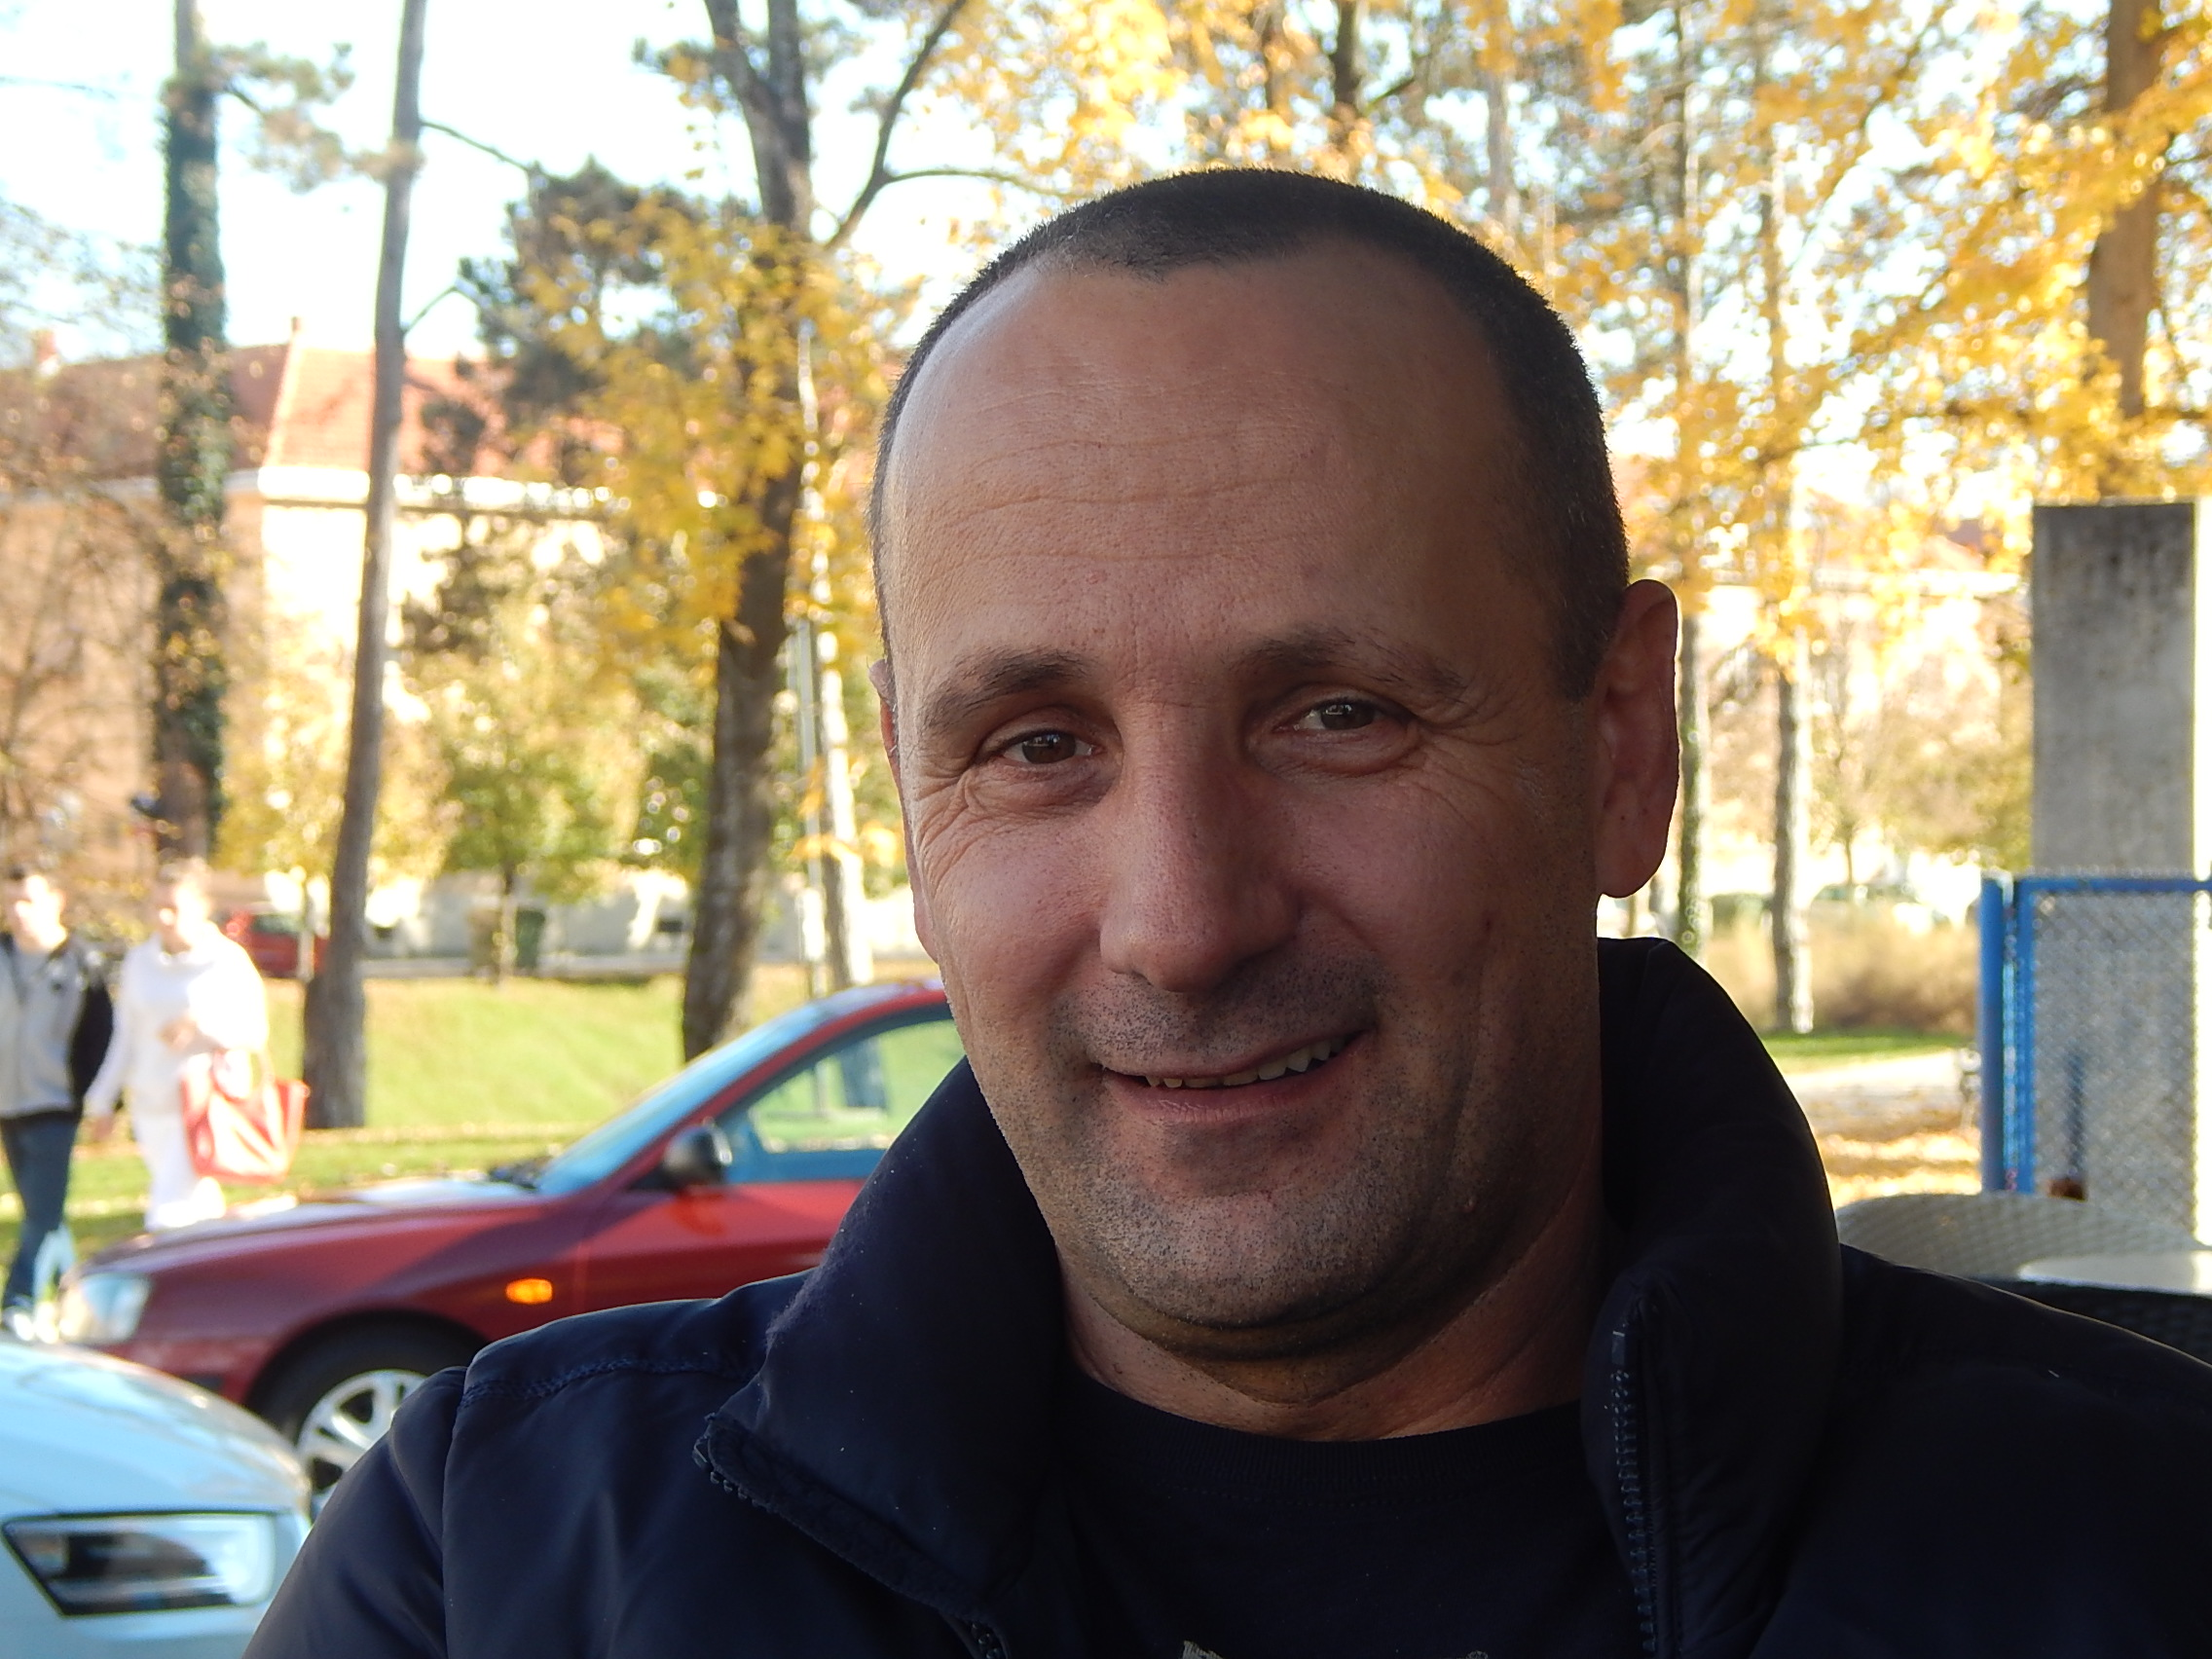 Davor Petračić, Karlovac, 9. 11. 2015. Foto: Marin Bakić